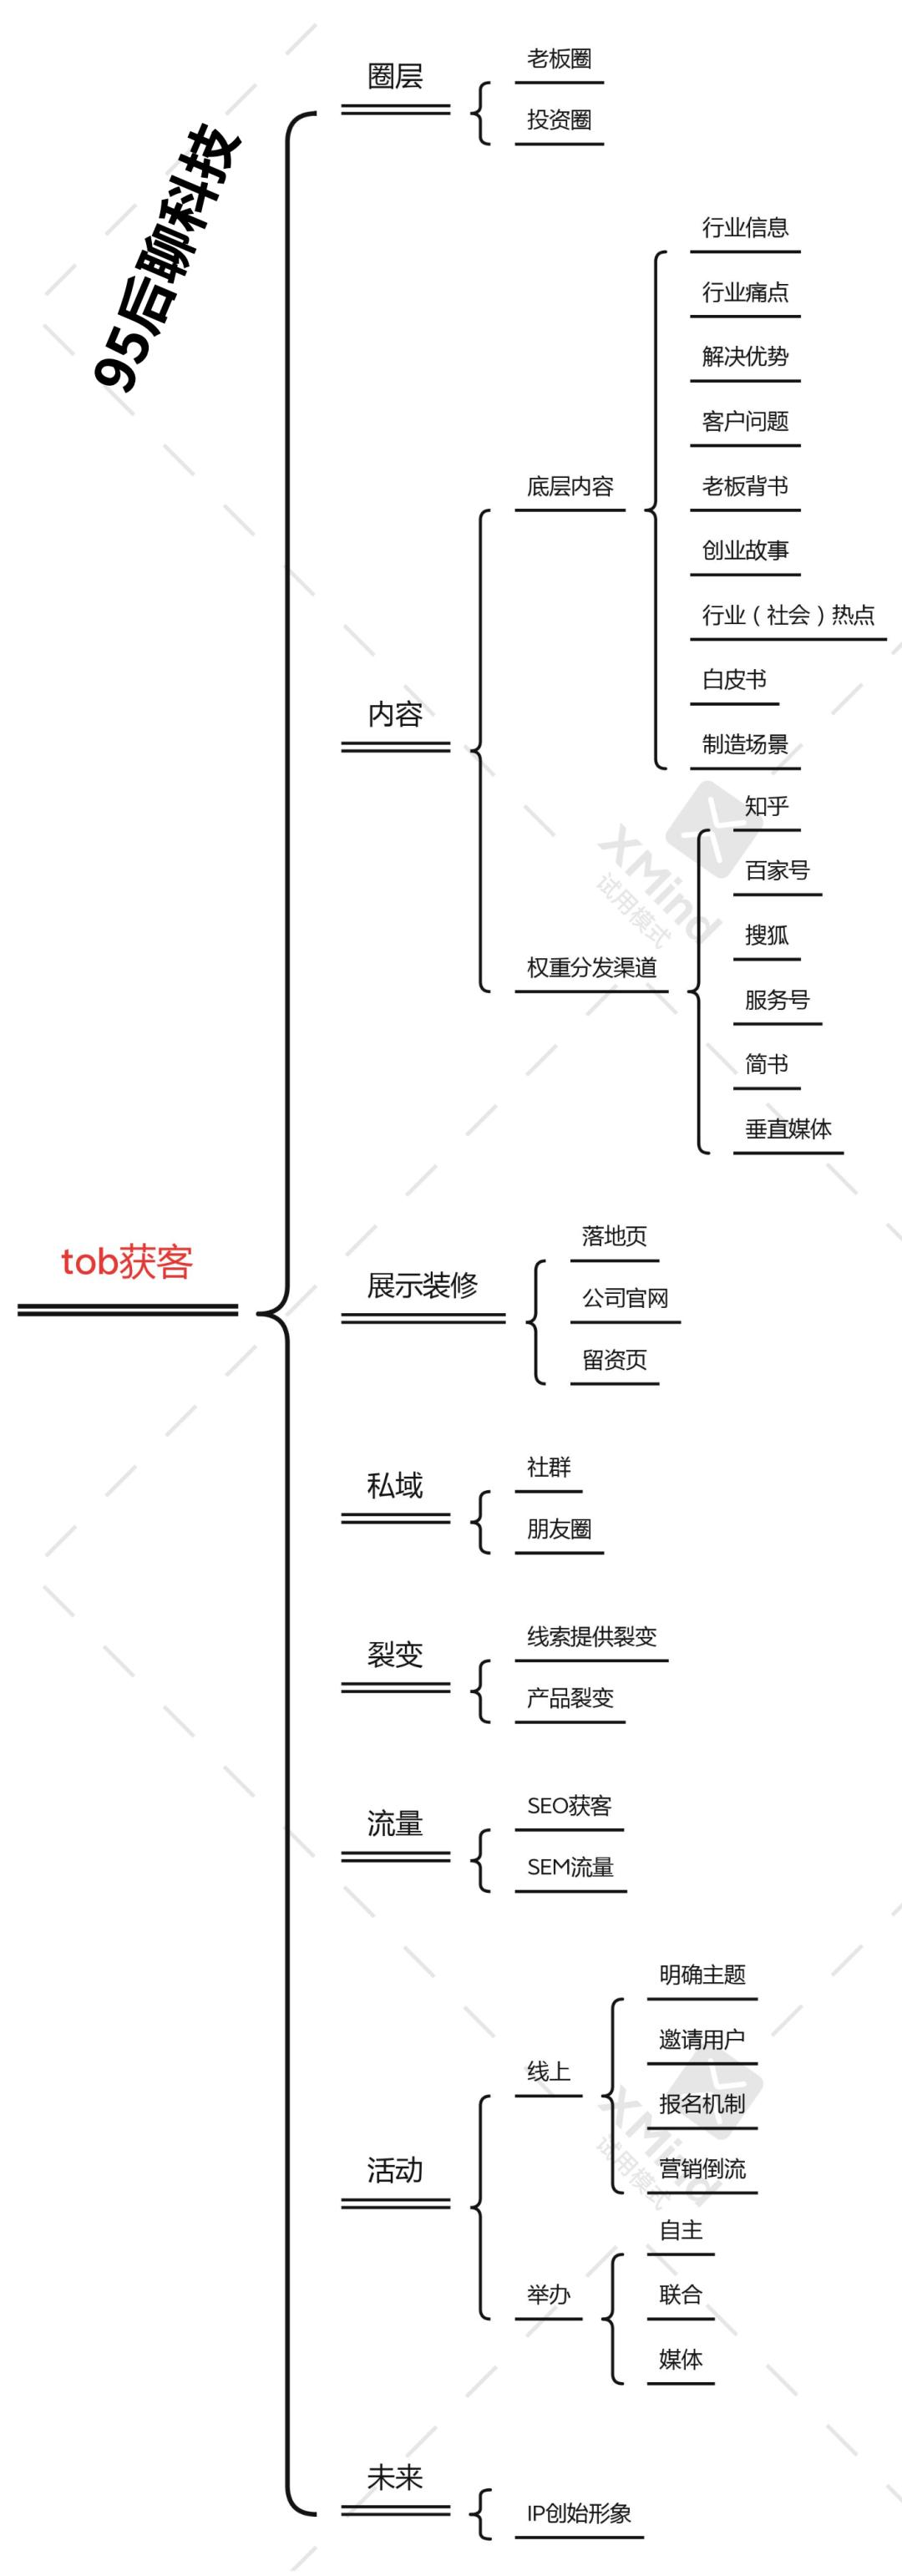 tob获客的增长公式